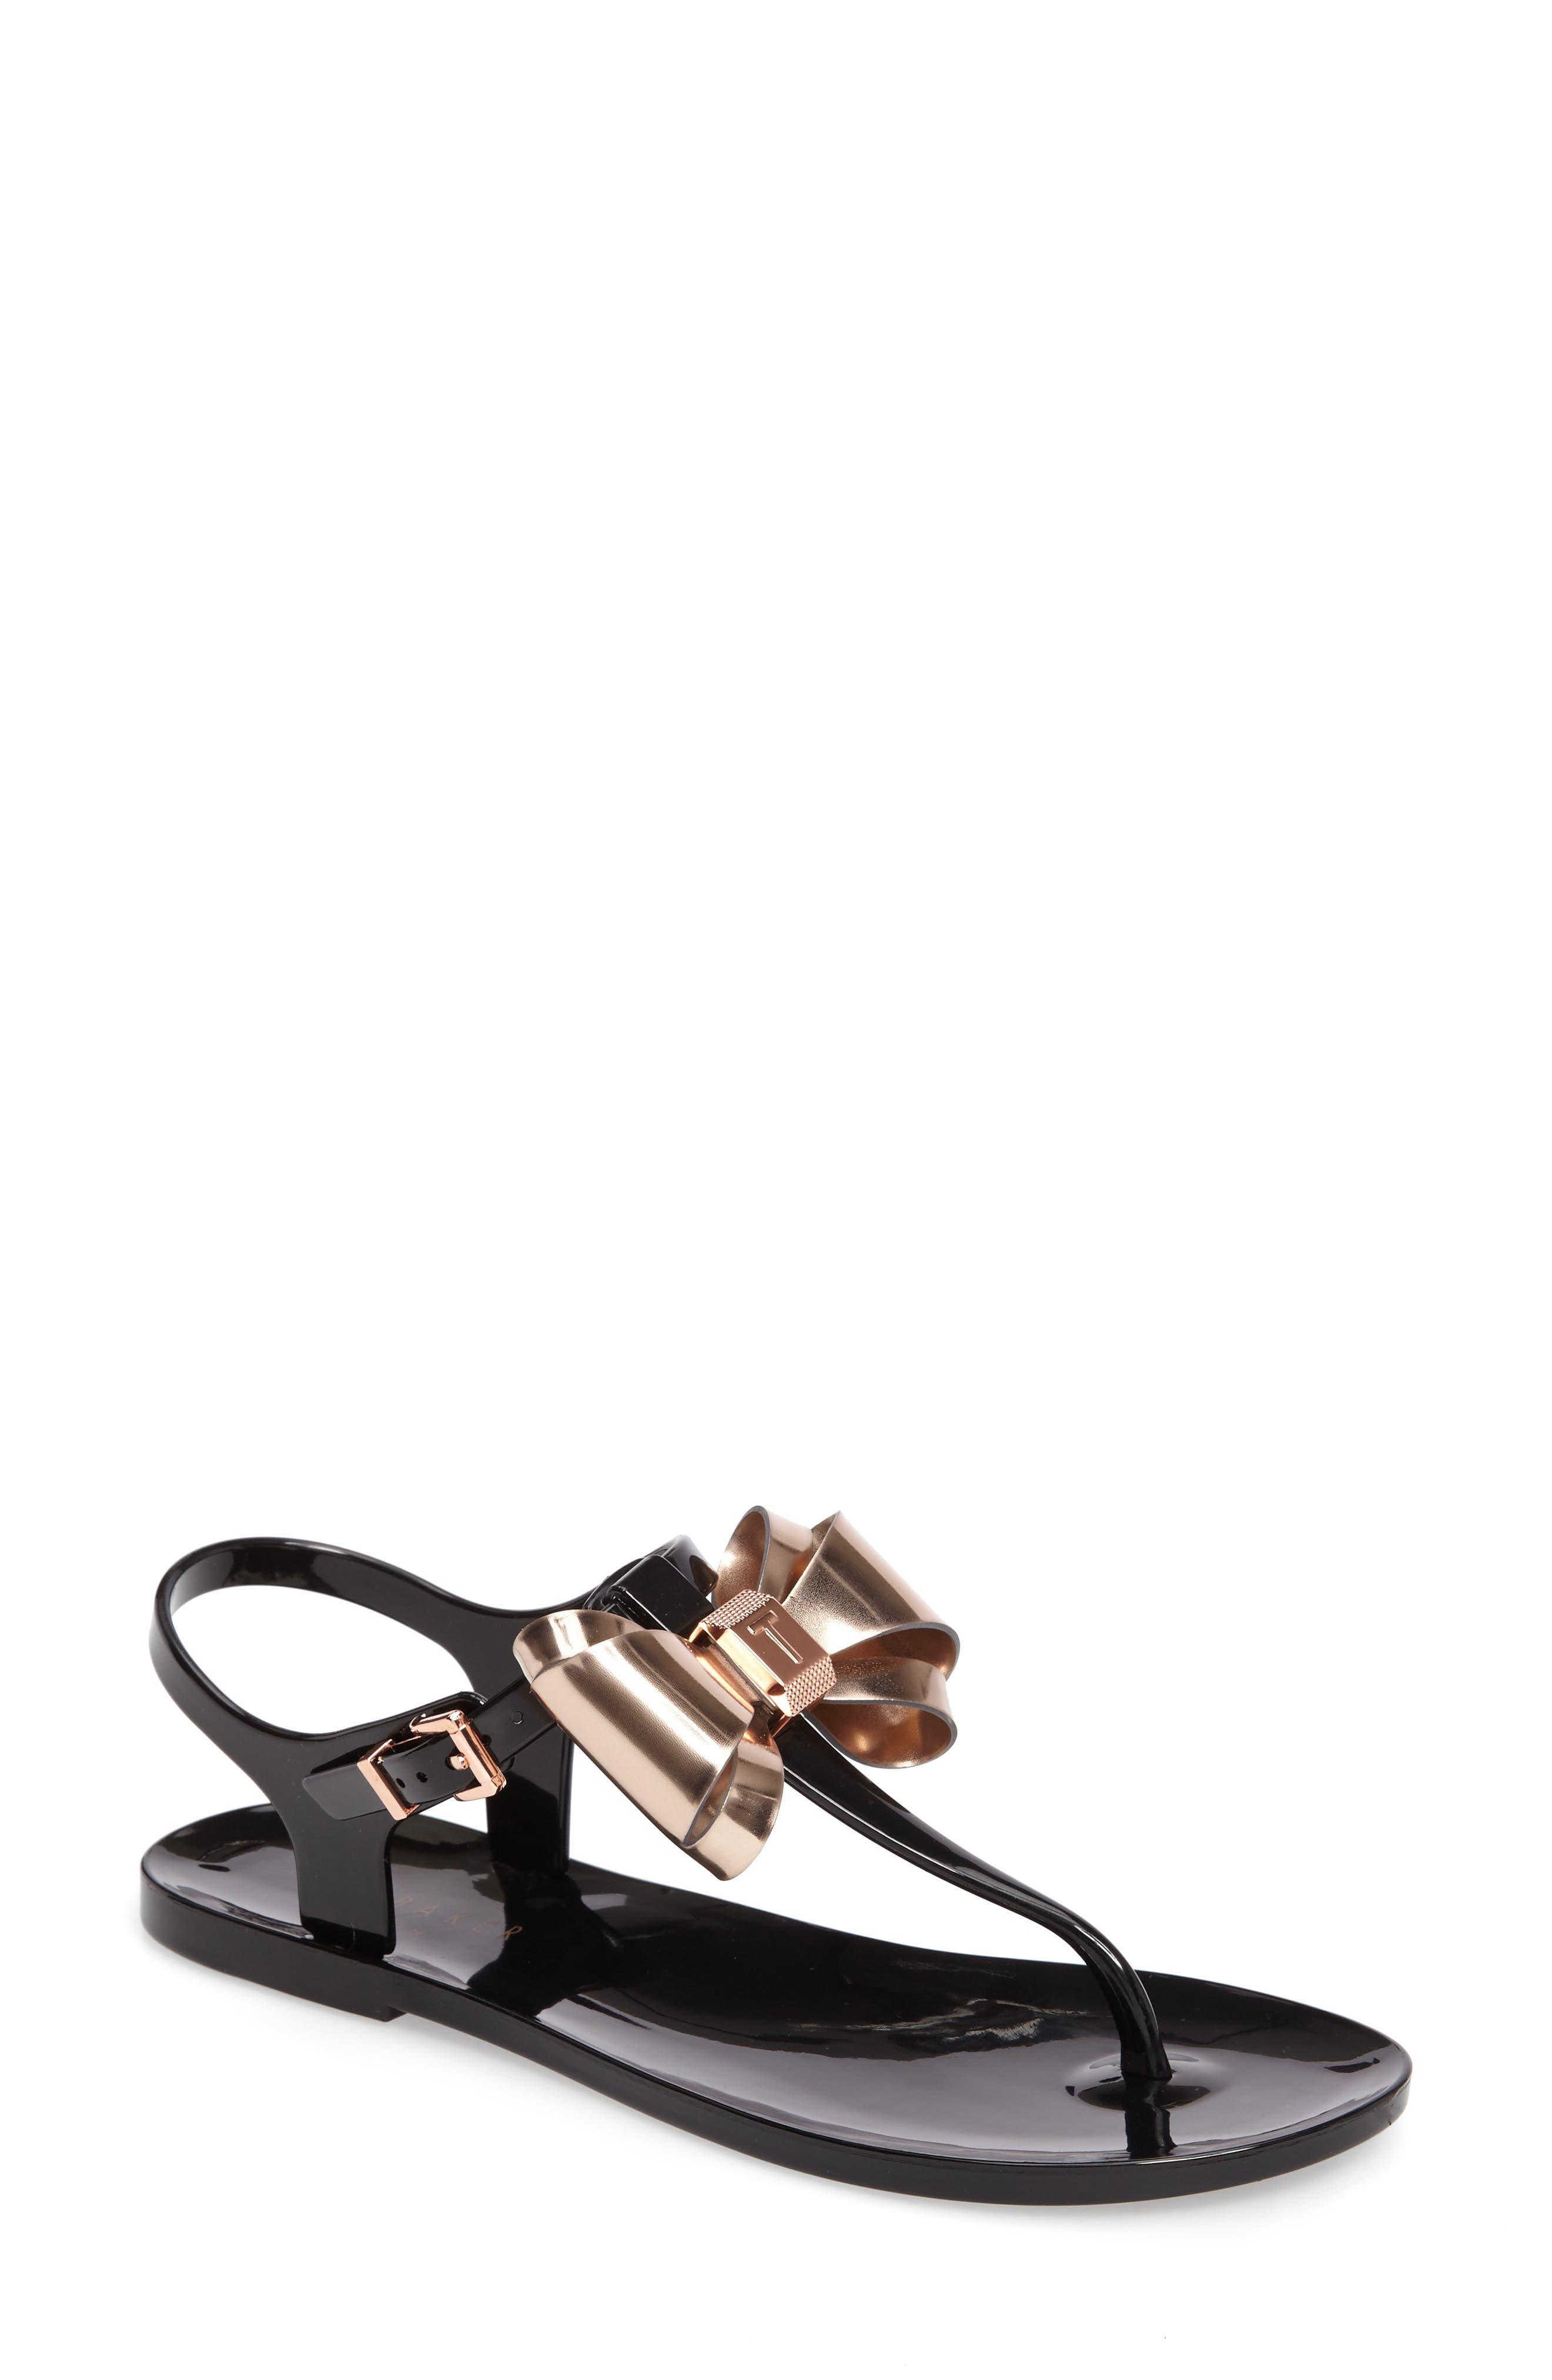 Ainda Slingback Bow Sandal, Main, color, 002